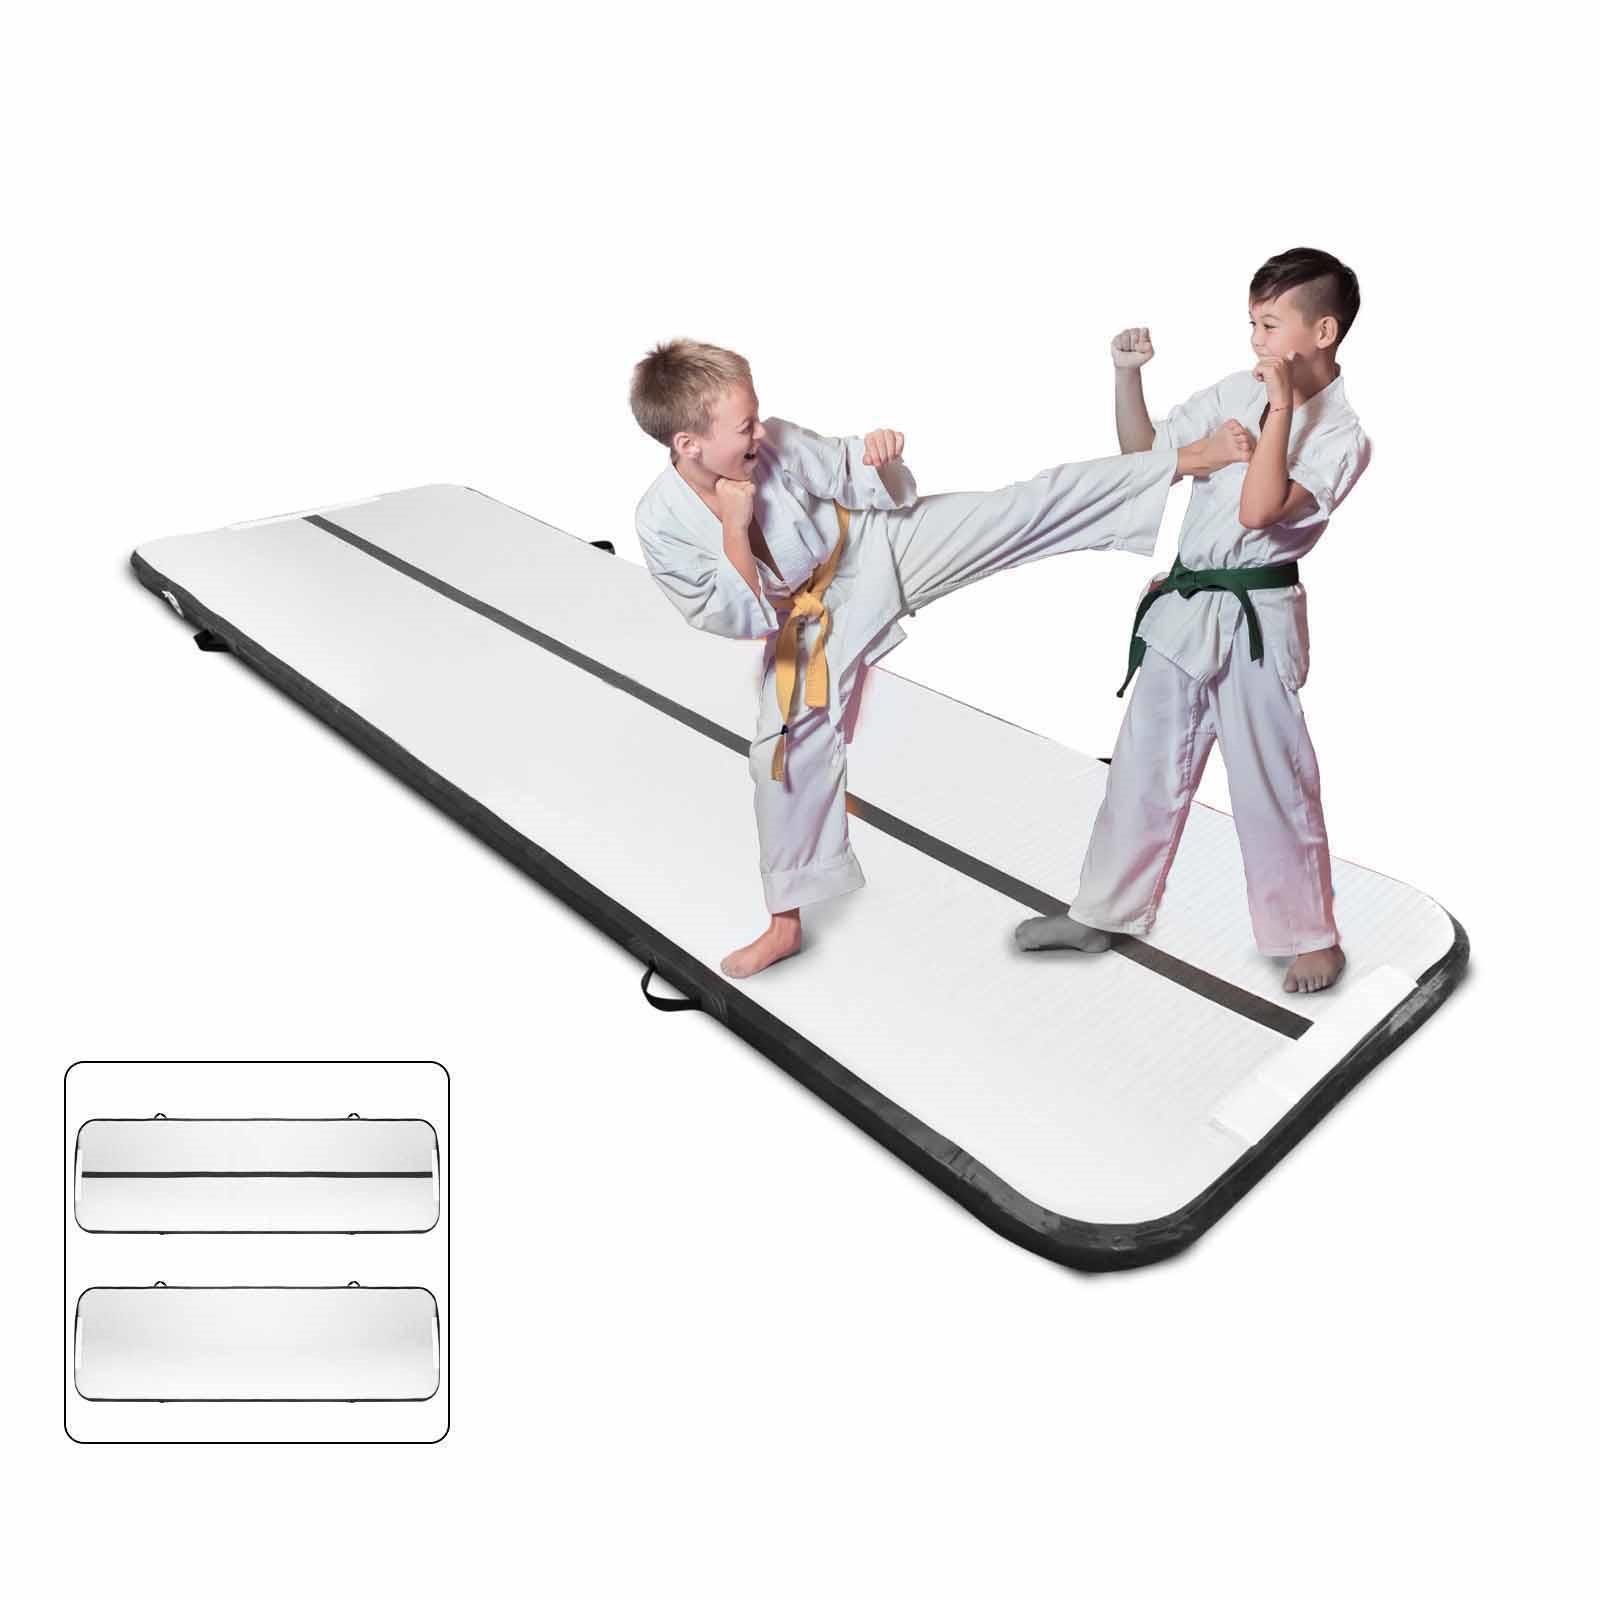 Air-Track-10x3FT-Trumbling-Airtrack-Gymnastics-Yoga-Floor-Mat-Training-Pad-Home thumbnail 59